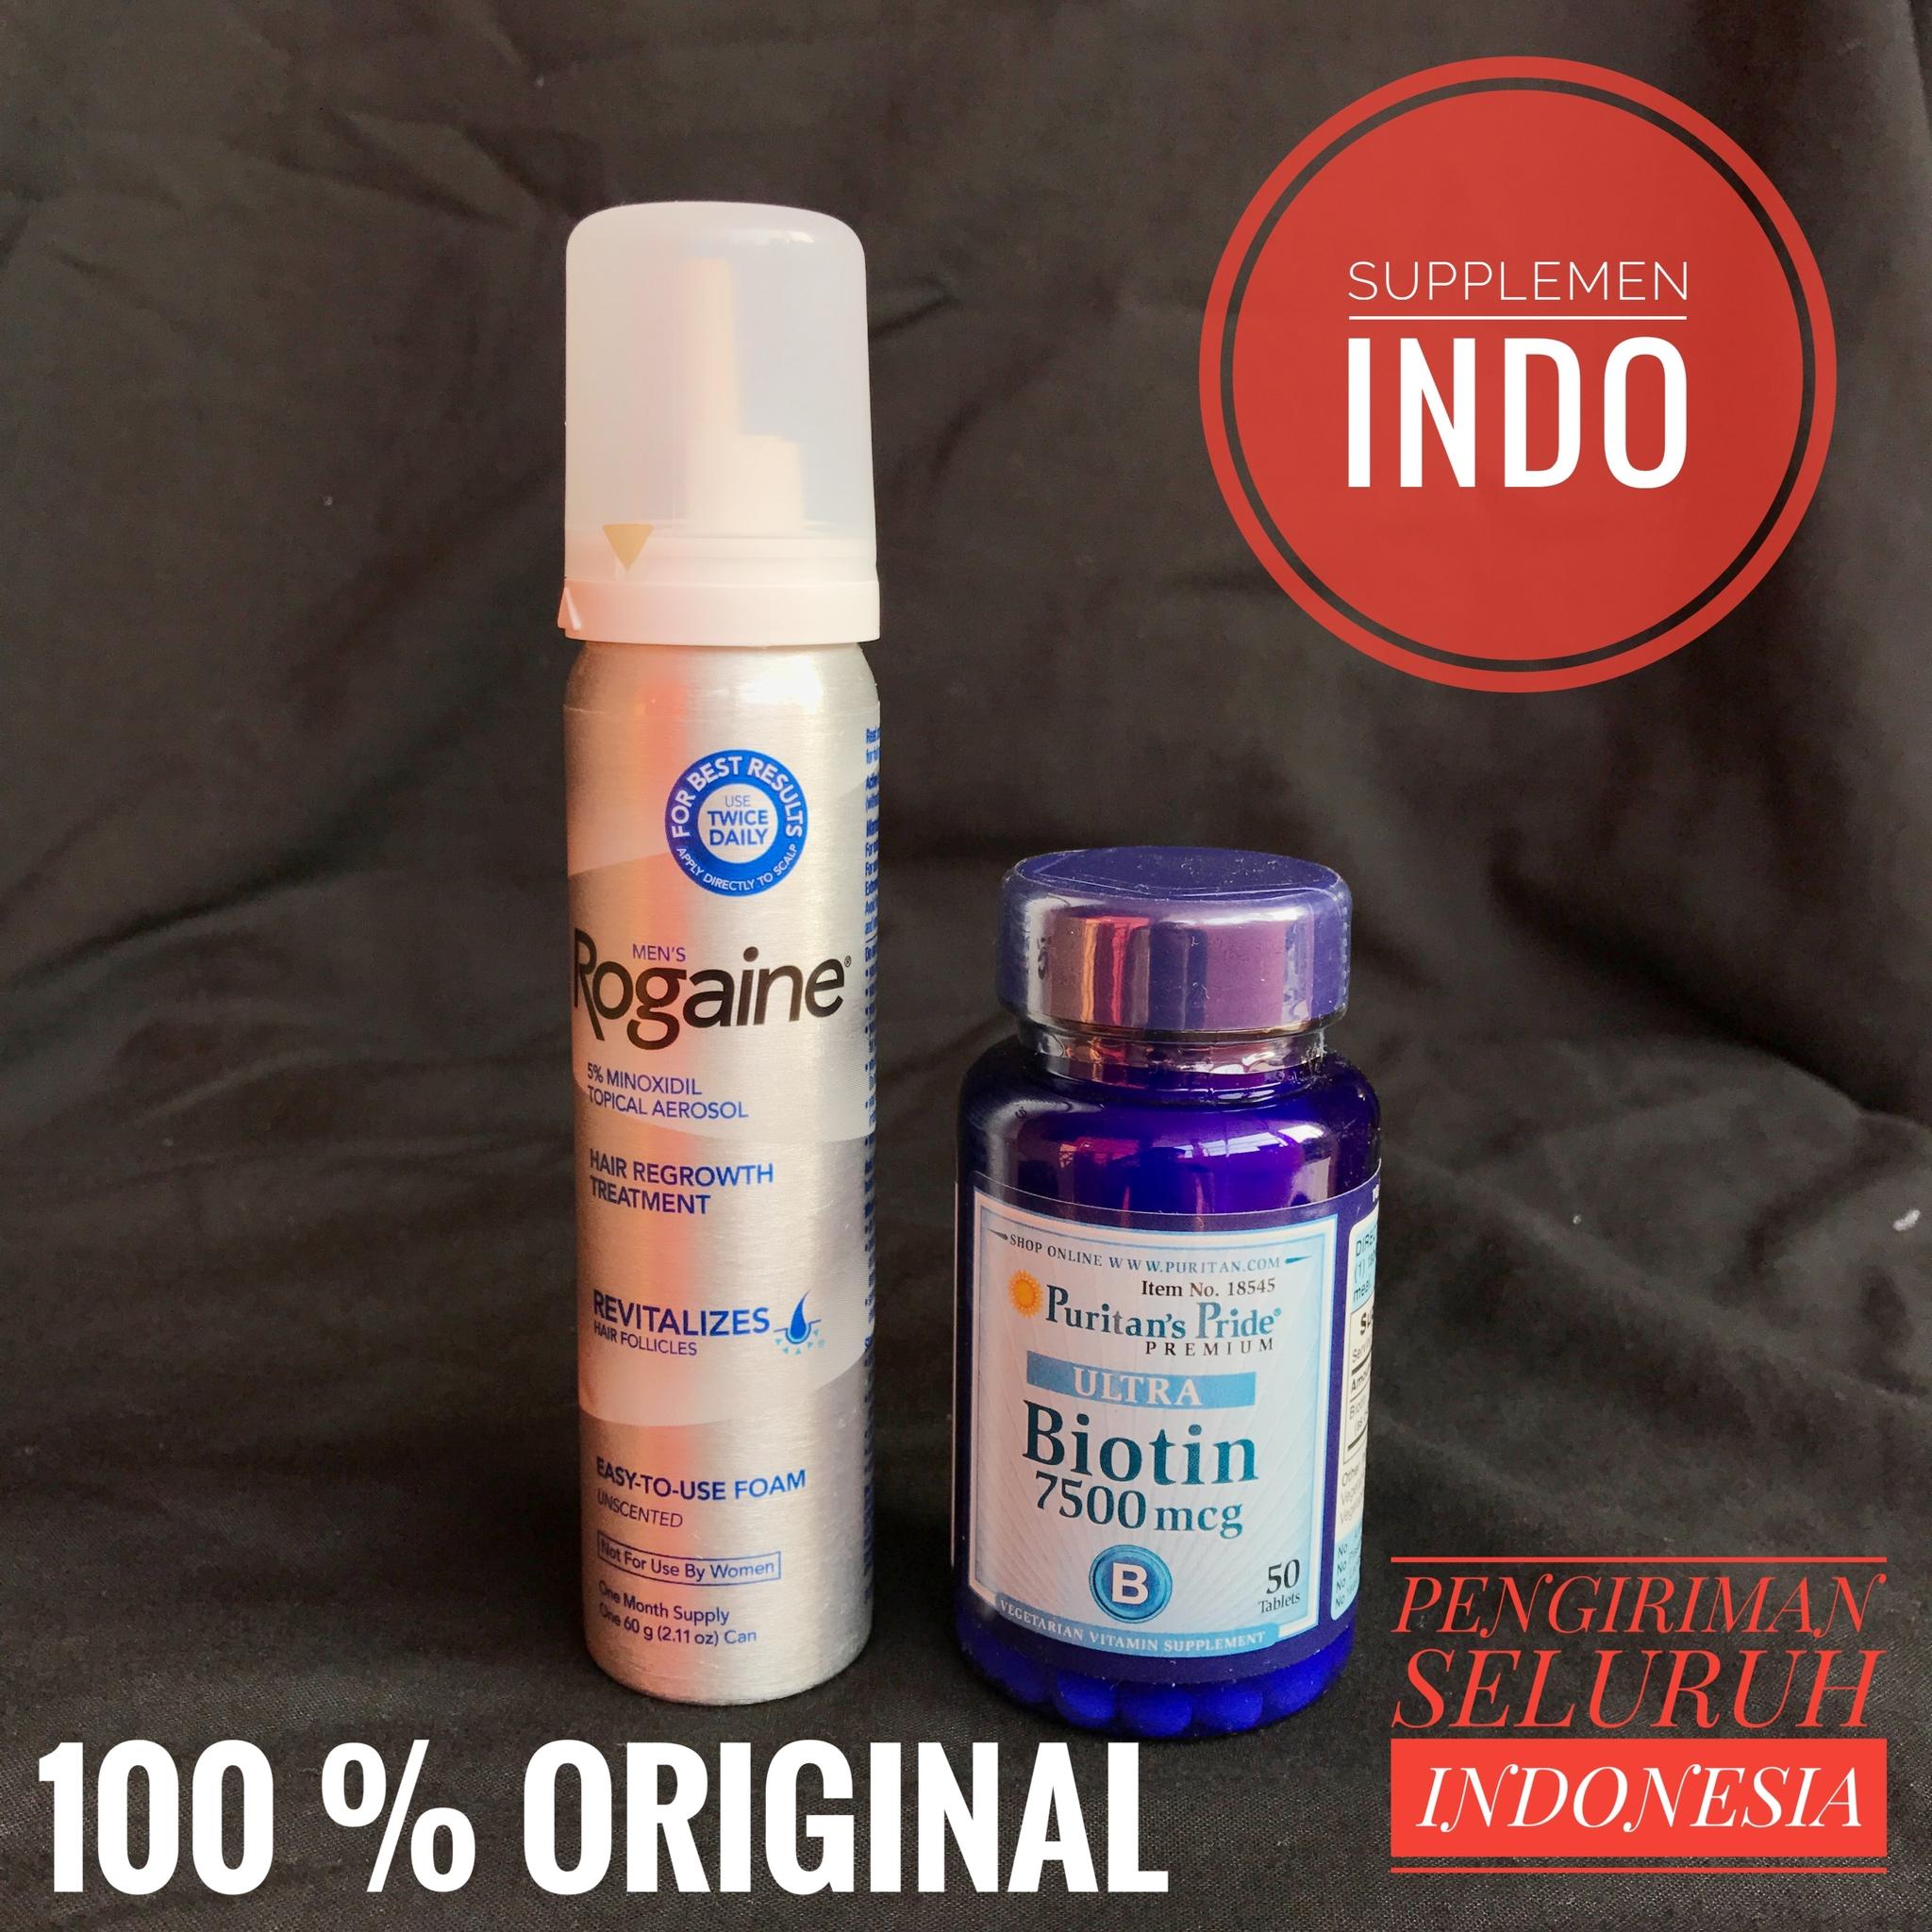 Jual Paket Rogaine Foam Mens Puritan Pride Biotin 7500 Mcg Isi 50 5 1 Botol Tabs Supplemen Indo Tokopedia